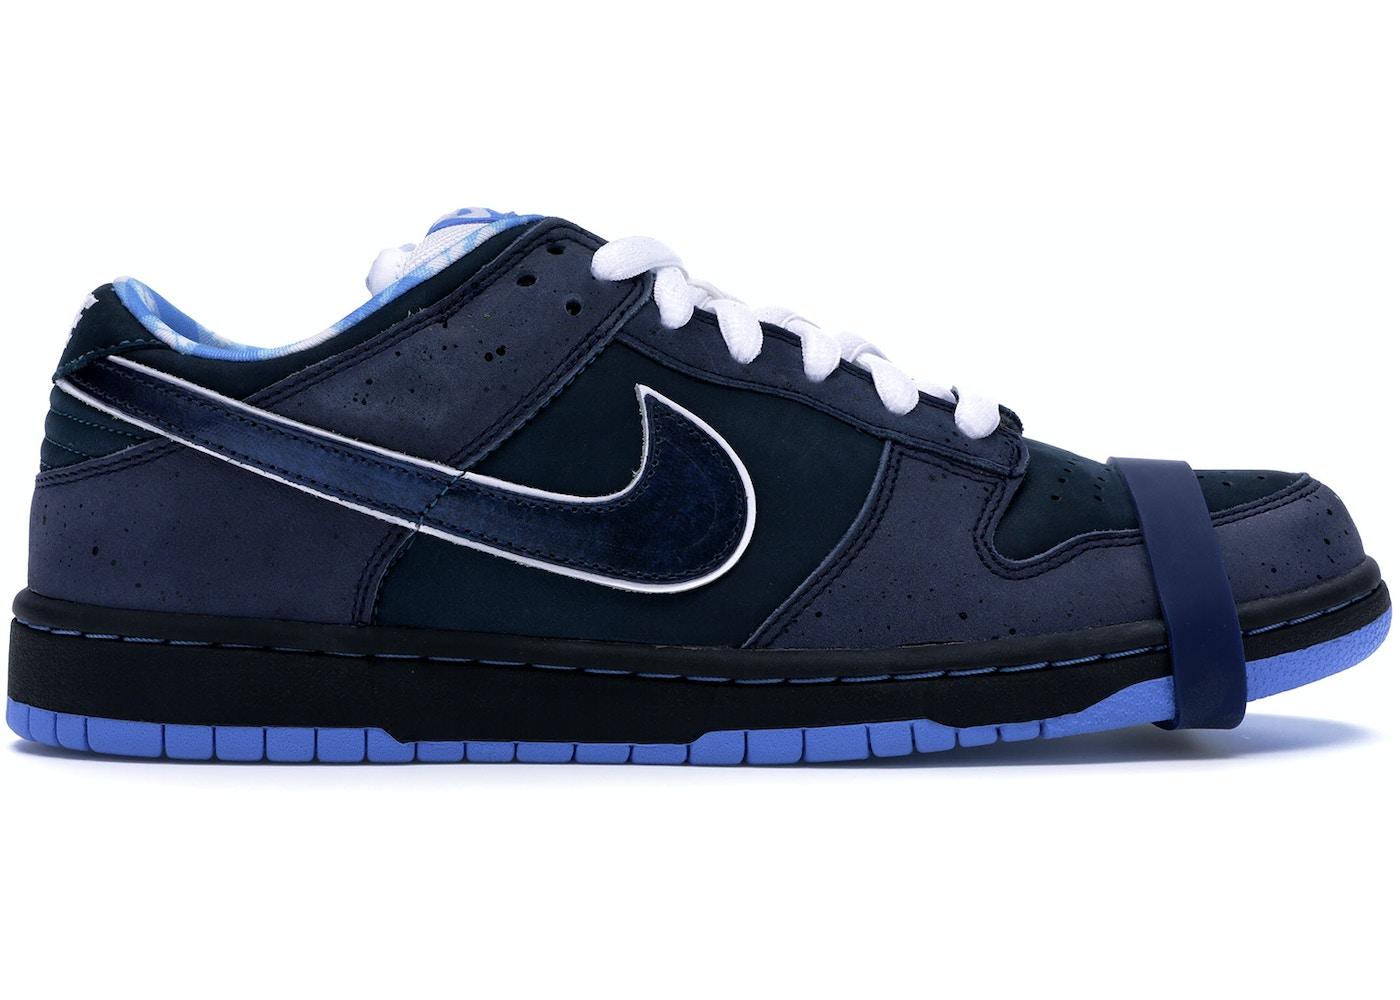 Nike Dunk SB Low Blue Lobster - 313170-342 e9eb45a3e